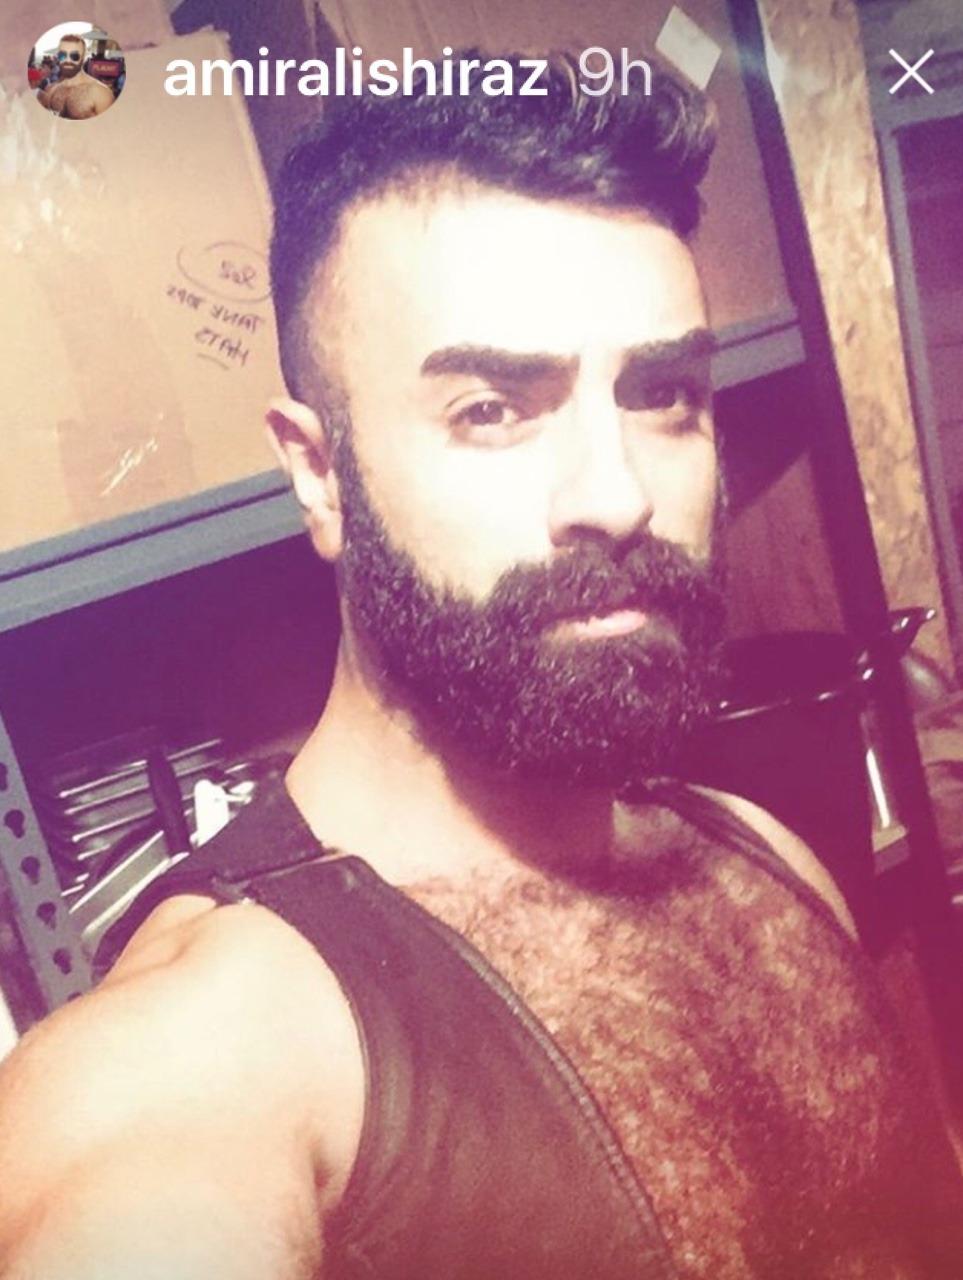 amiralishiraz instagram beardburnme https://www.neofic.com